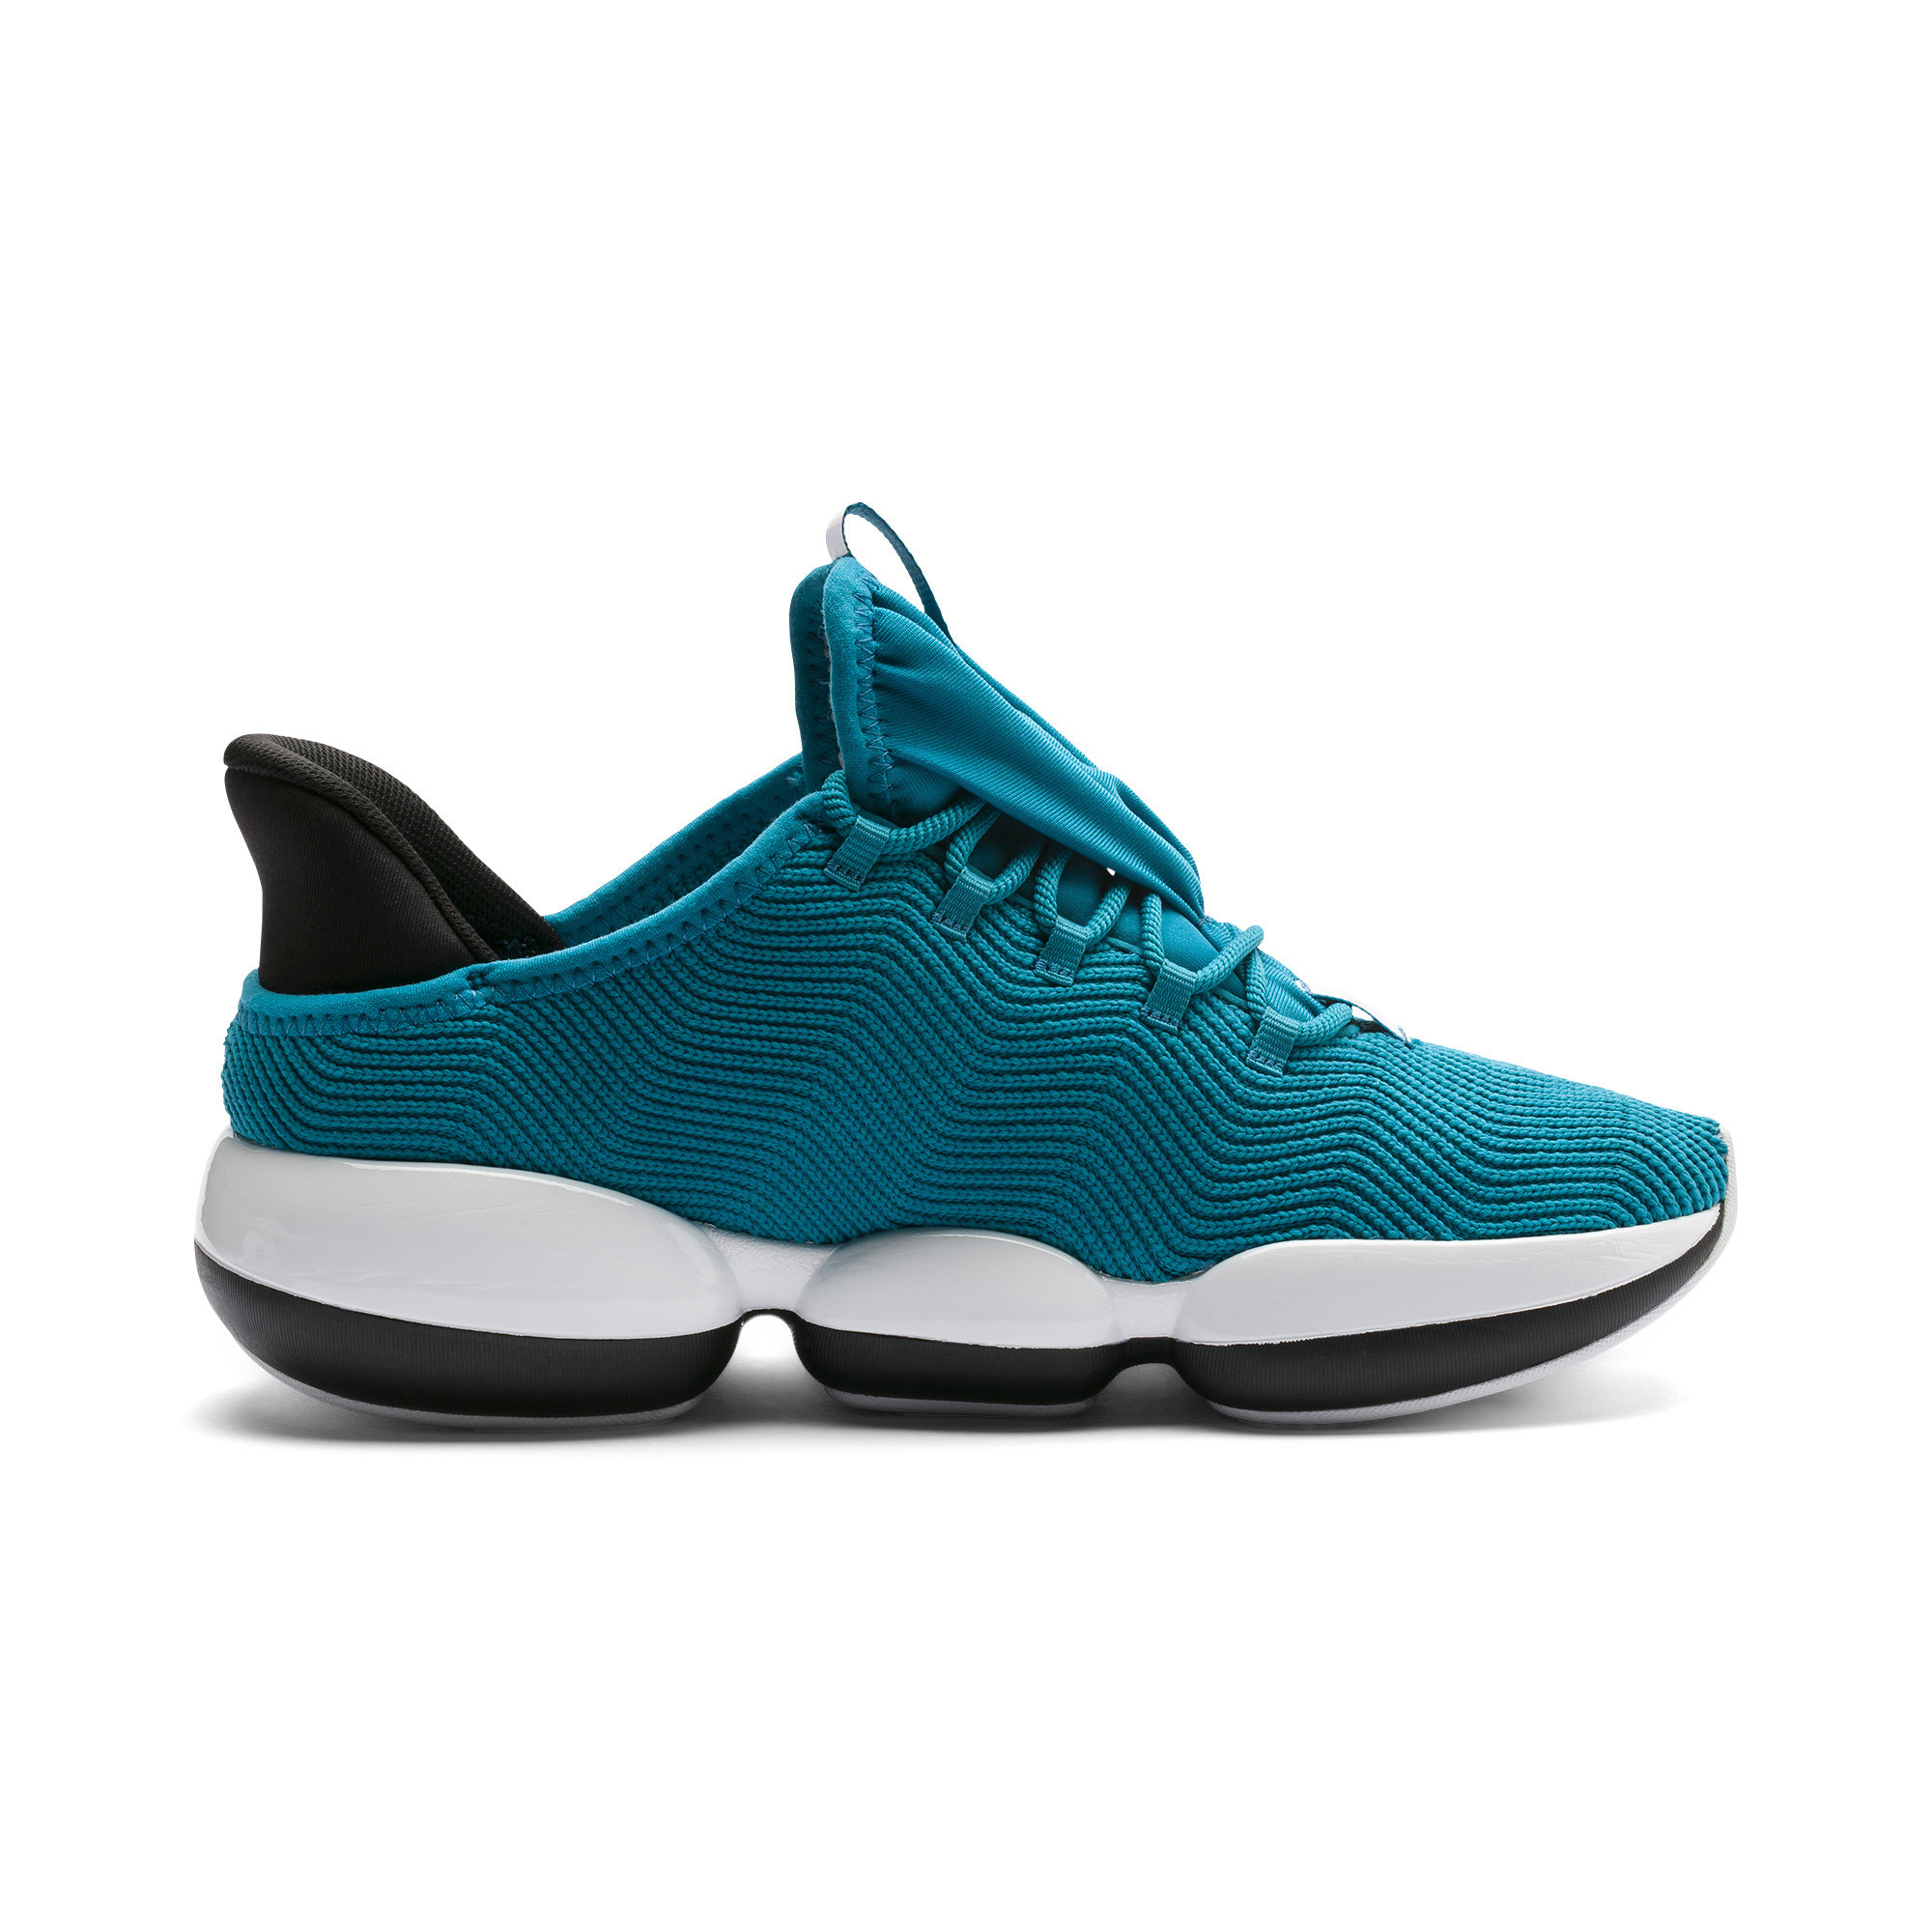 online store a859b 7f0e8 Image Puma Mode XT Iridescent Trailblazer Women s Sneakers  6